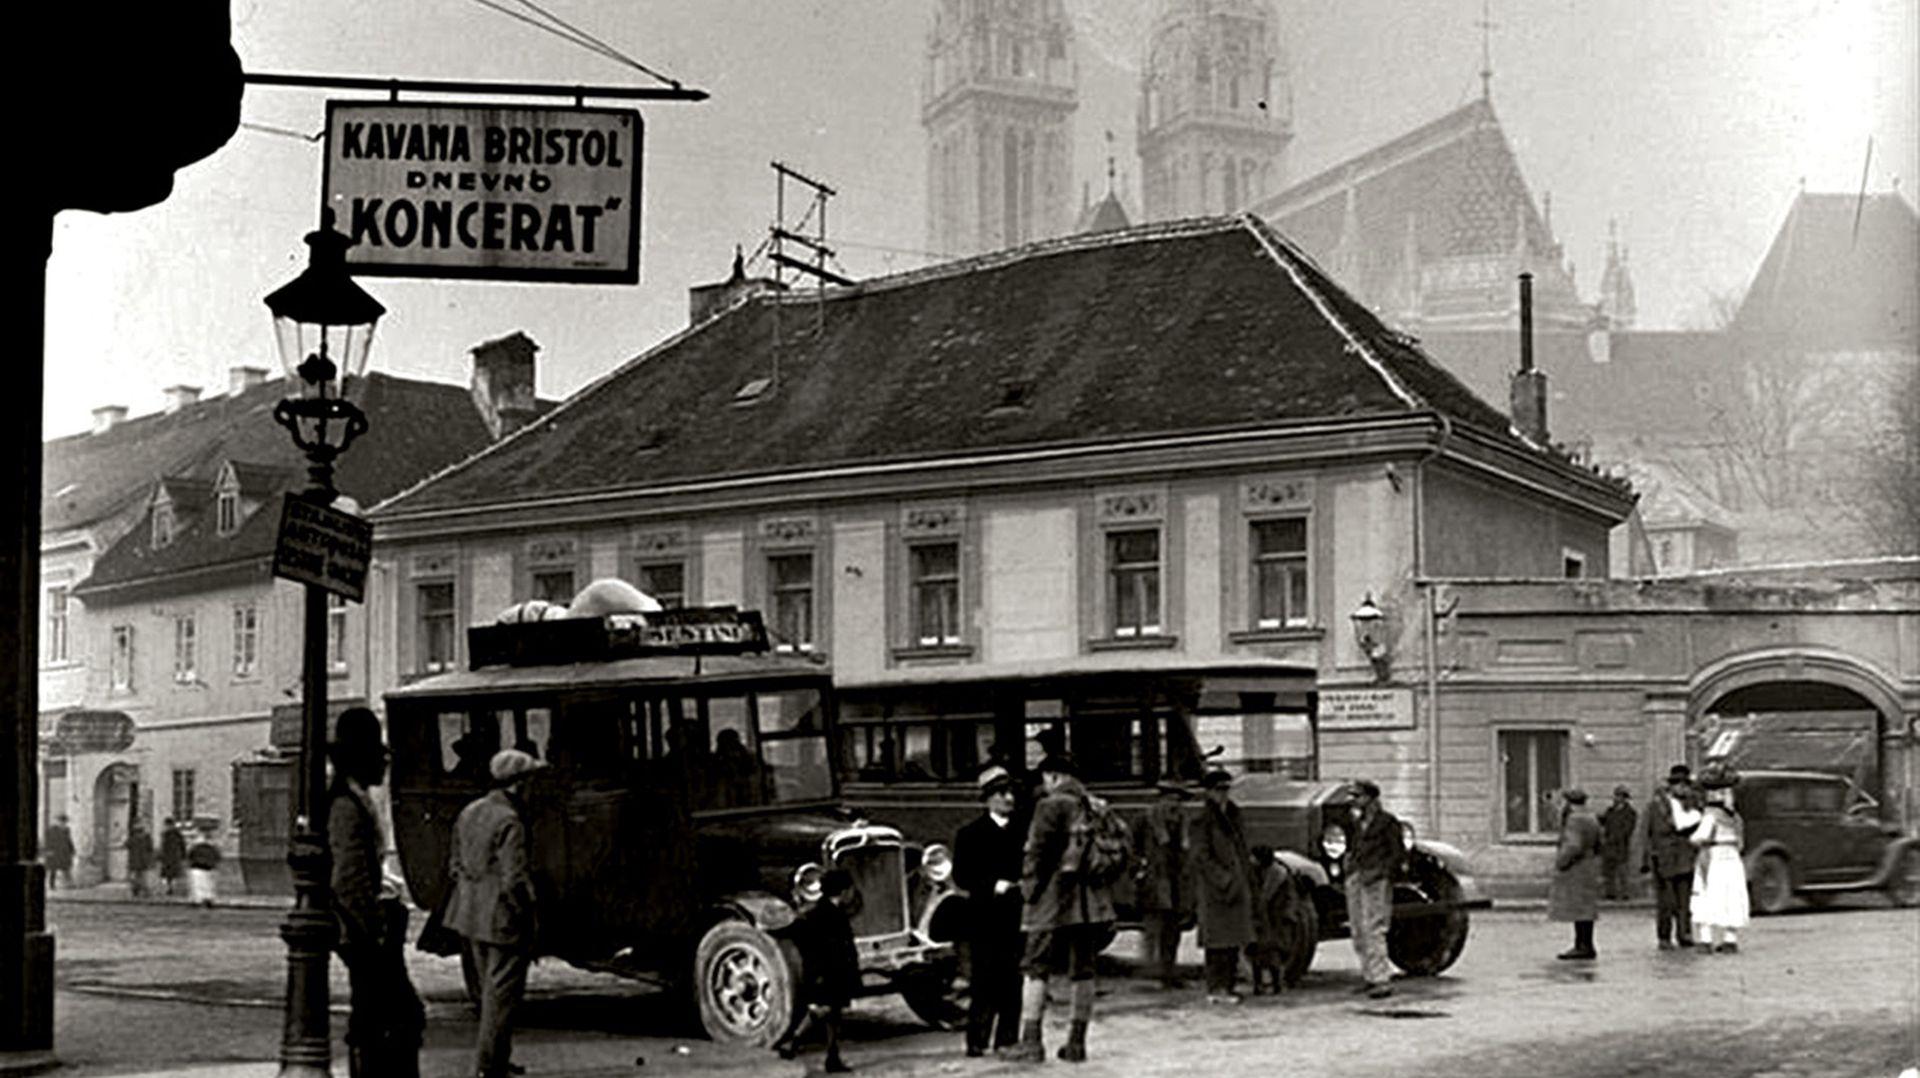 ZAGREB 1920-ih: Grad plesnjaka, jazza, kavana i životne radosti